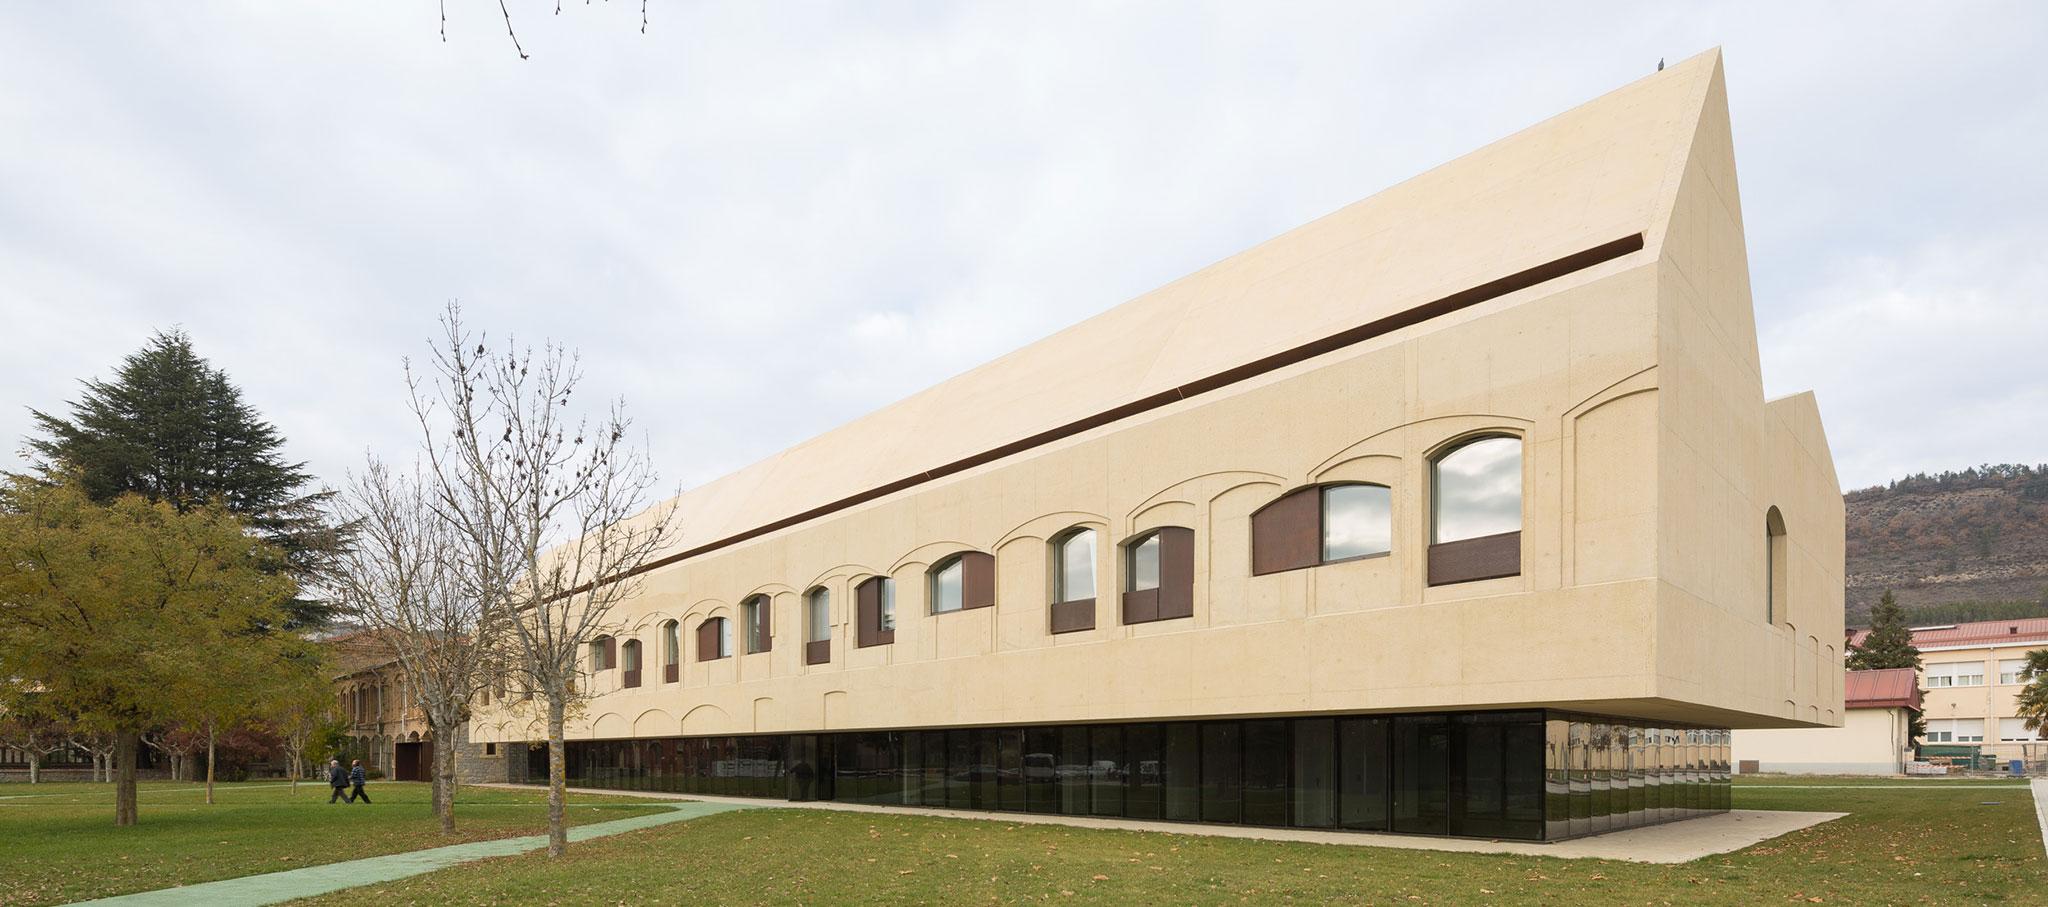 Psychiatric Center – Refurbishment & Extension by Vaillo+Irigaray Architects, Galar, Vélaz. Photograph © Rubén P. Bescós